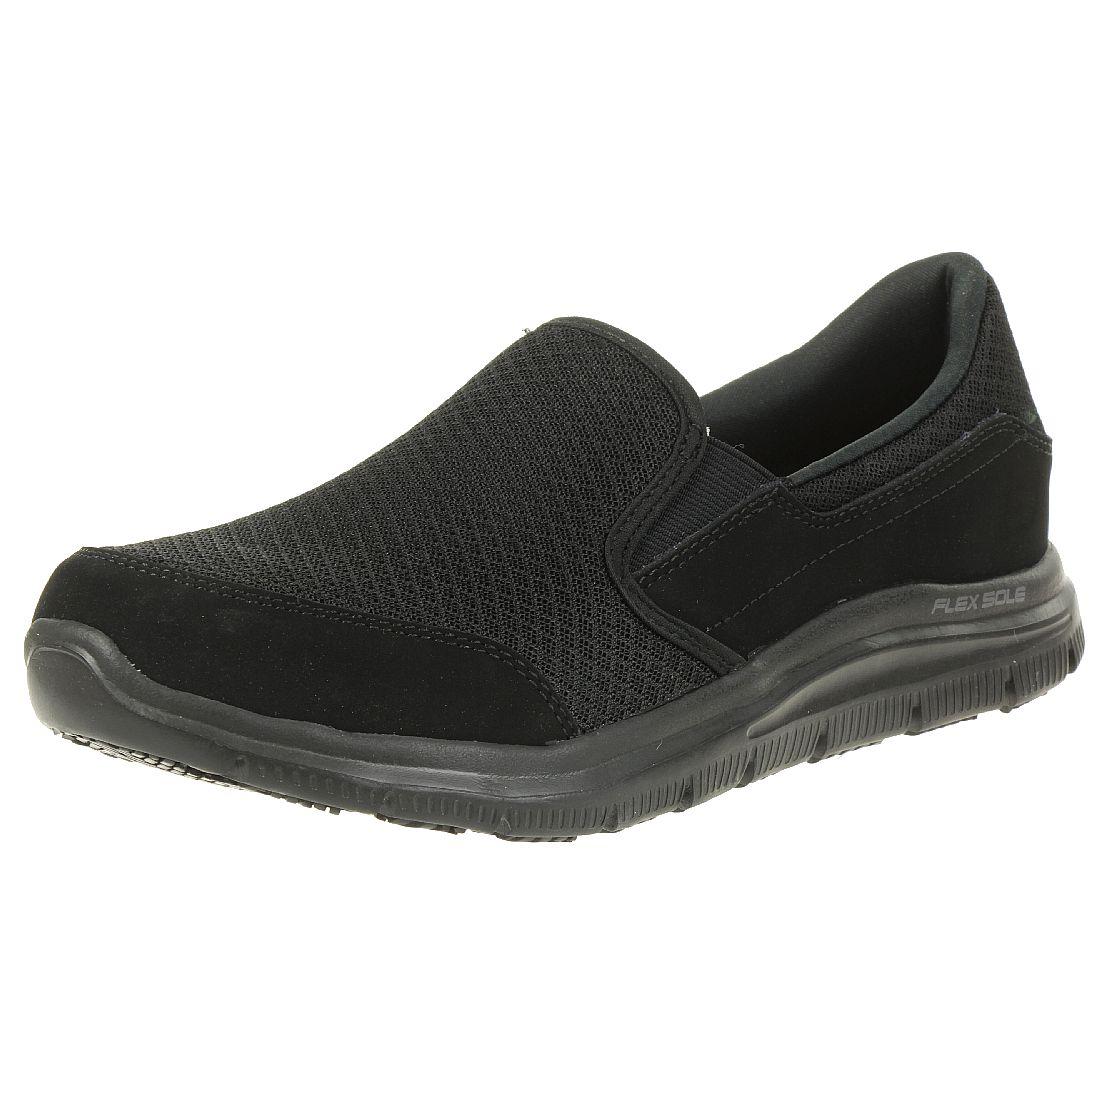 skechers cozard damen sneaker arbeitsschuhe kellner slip on schwarz sneaker damen 37 38. Black Bedroom Furniture Sets. Home Design Ideas